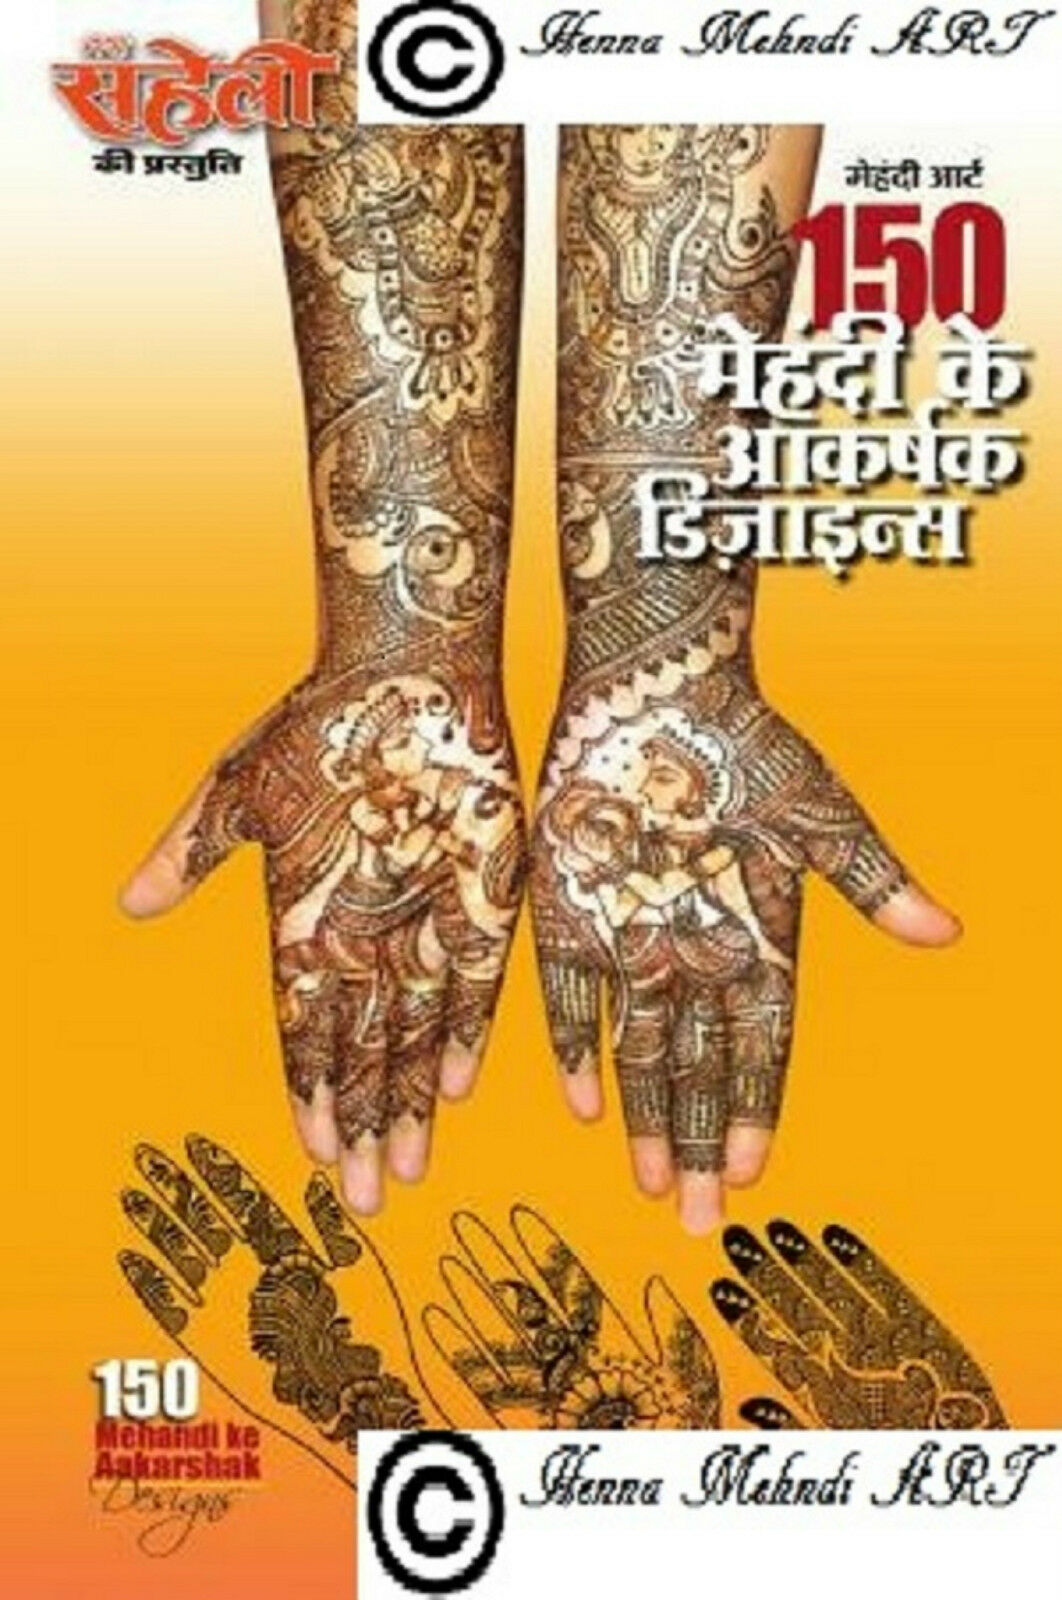 Henna Mehndi Tattoo Body Art Arabic Bridal Wedding Professional Designs Book Ebay